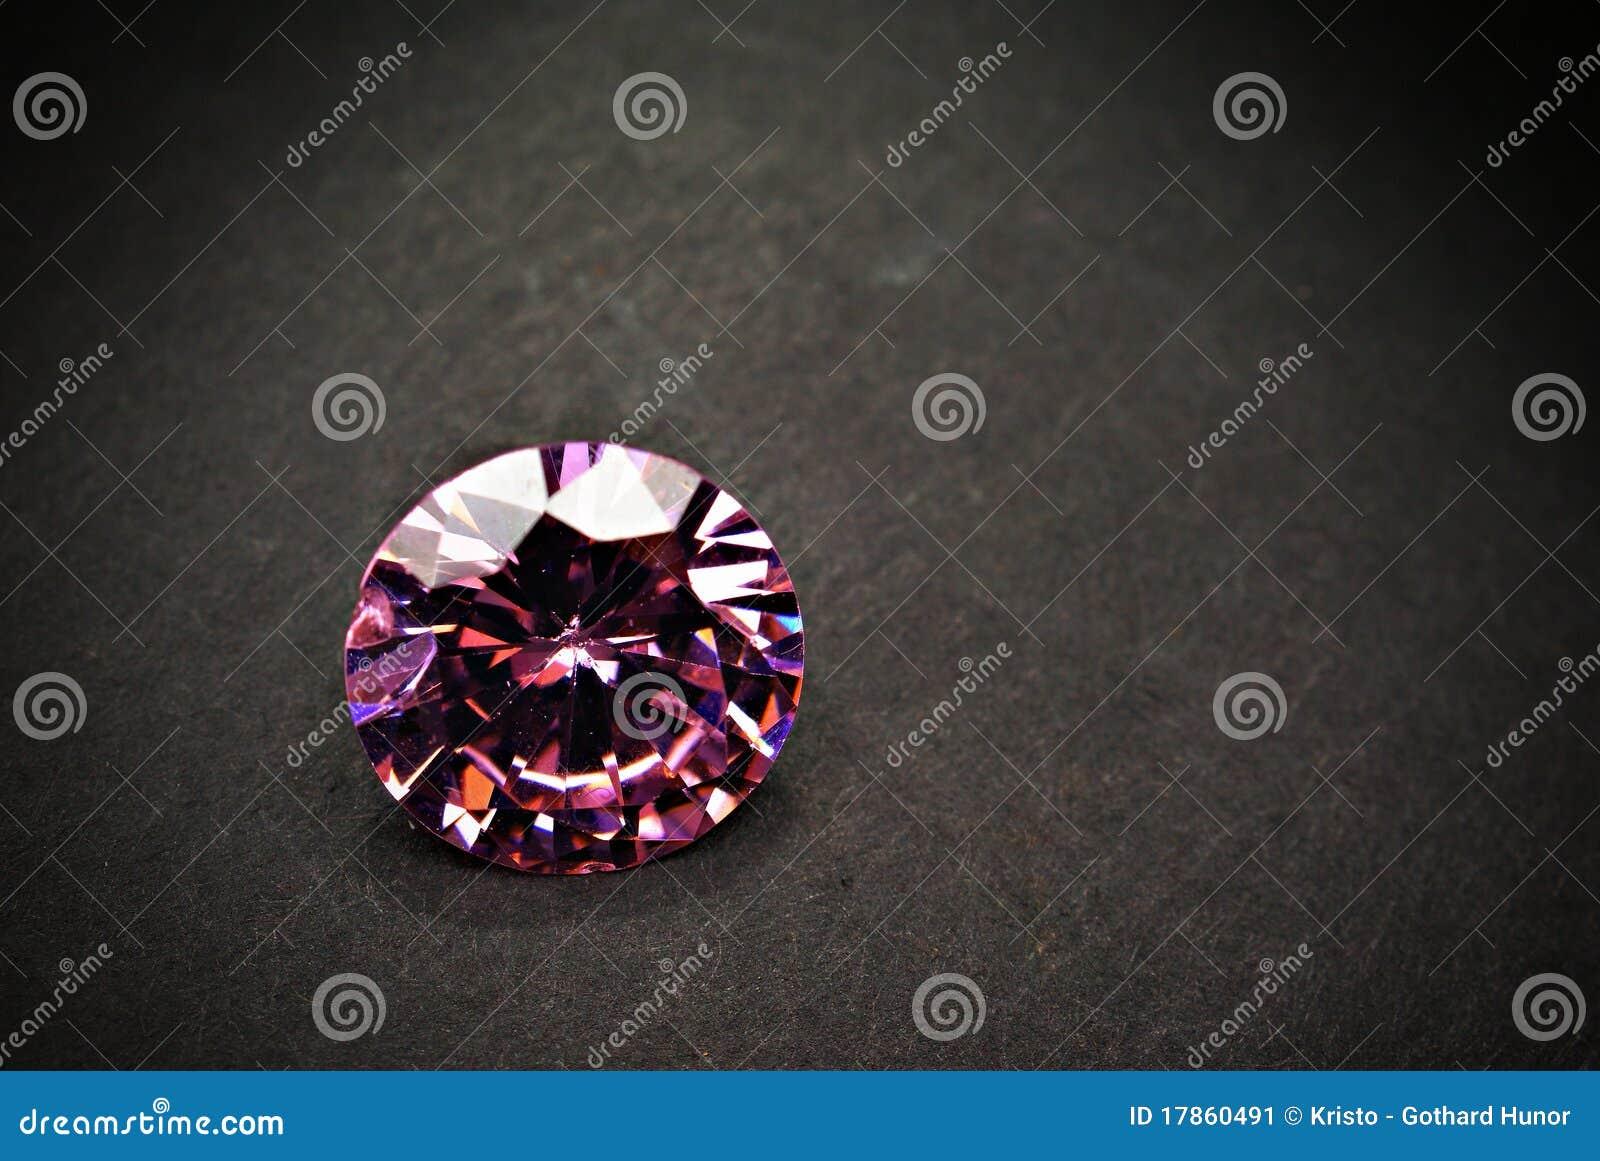 Amethyst Juwel